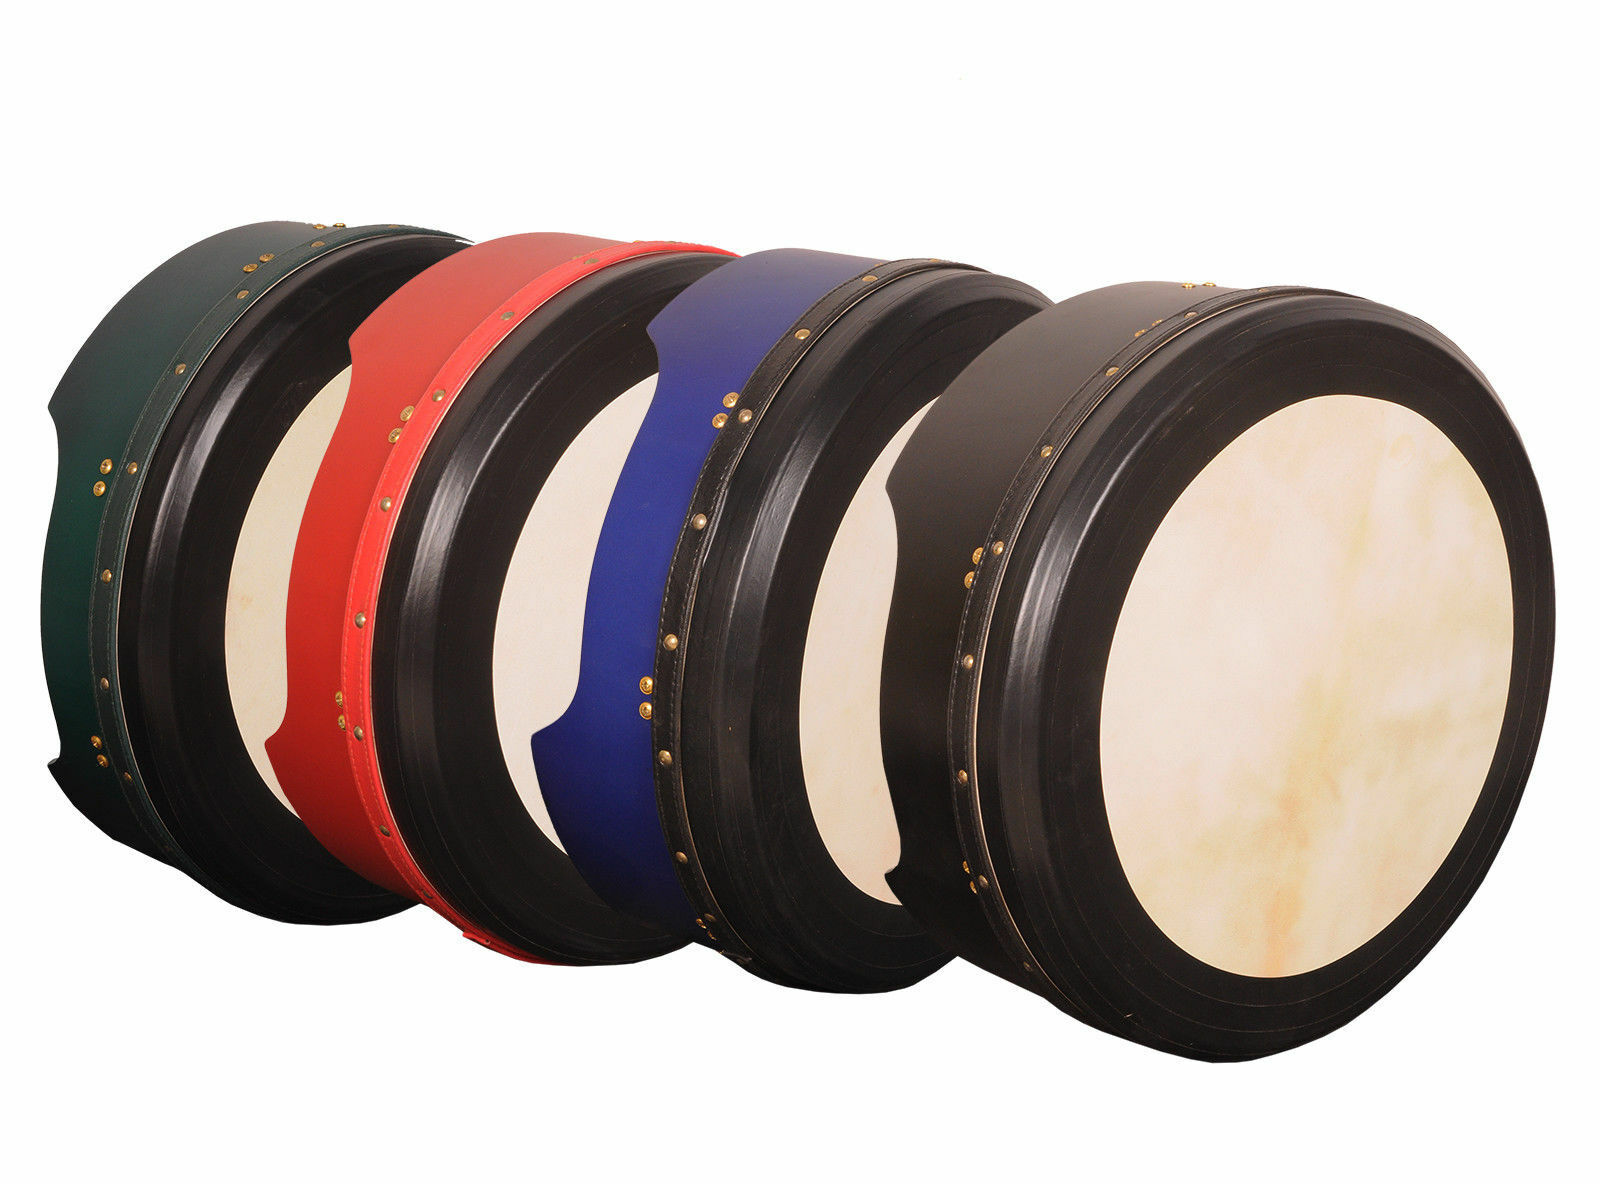 Muzikkon Irisch Bodhran, 40.6cmx15.2cm Bodhran Trommel Verstellbare & Pretuned